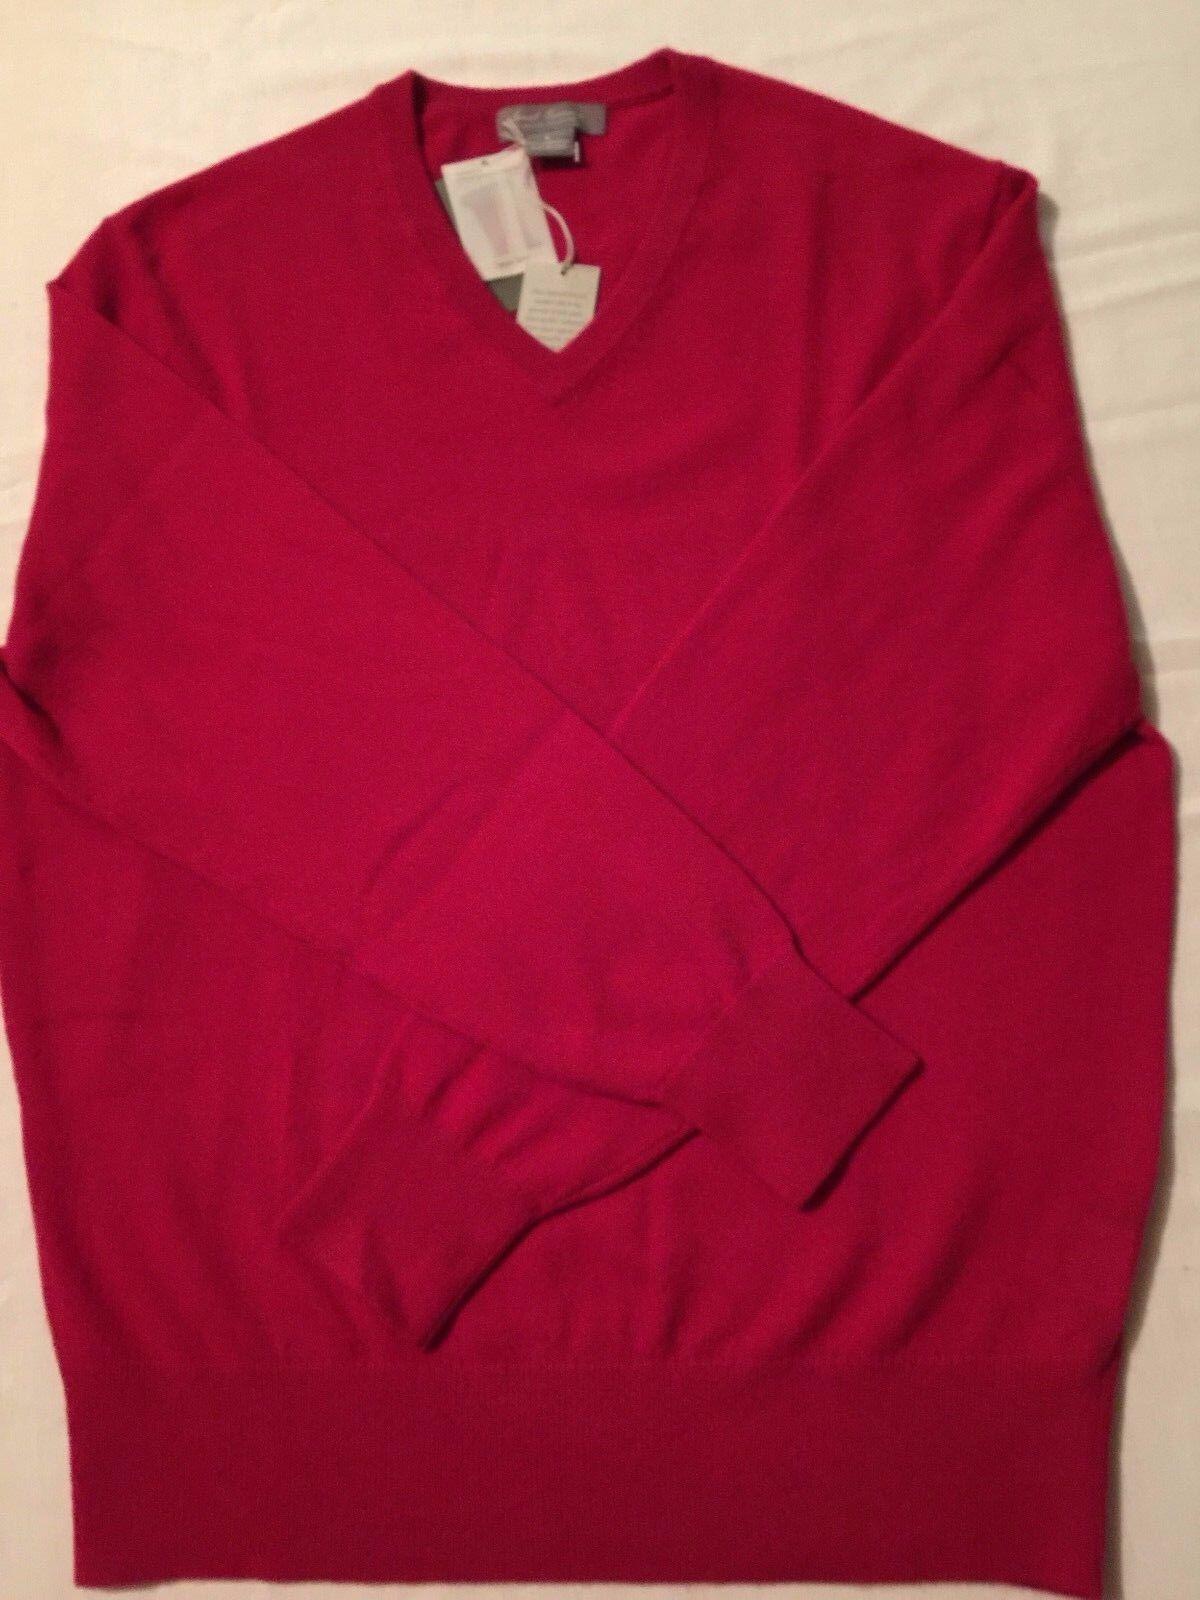 Daniel Cremieux Men's 100% Cashmere Sweater, ROT, Größe LG & XLG  NWT